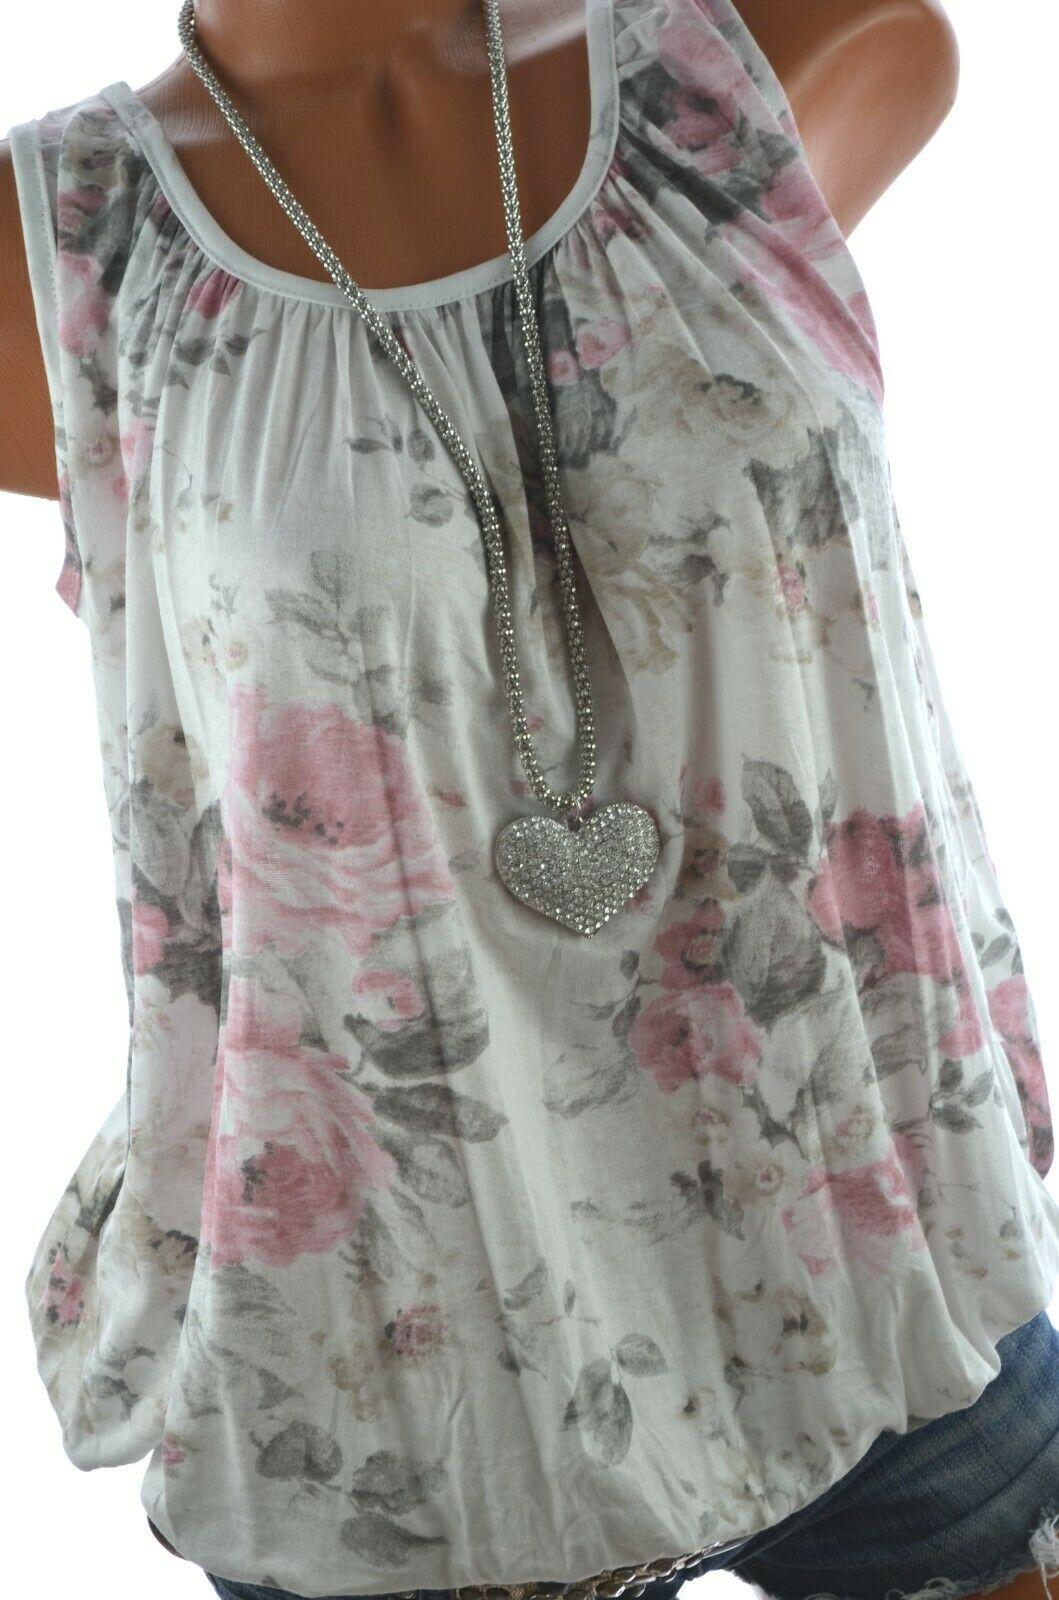 ITALY Sommer TOP Shirt Rosen Print Ballon Bluse 38 40 42 44 NEU